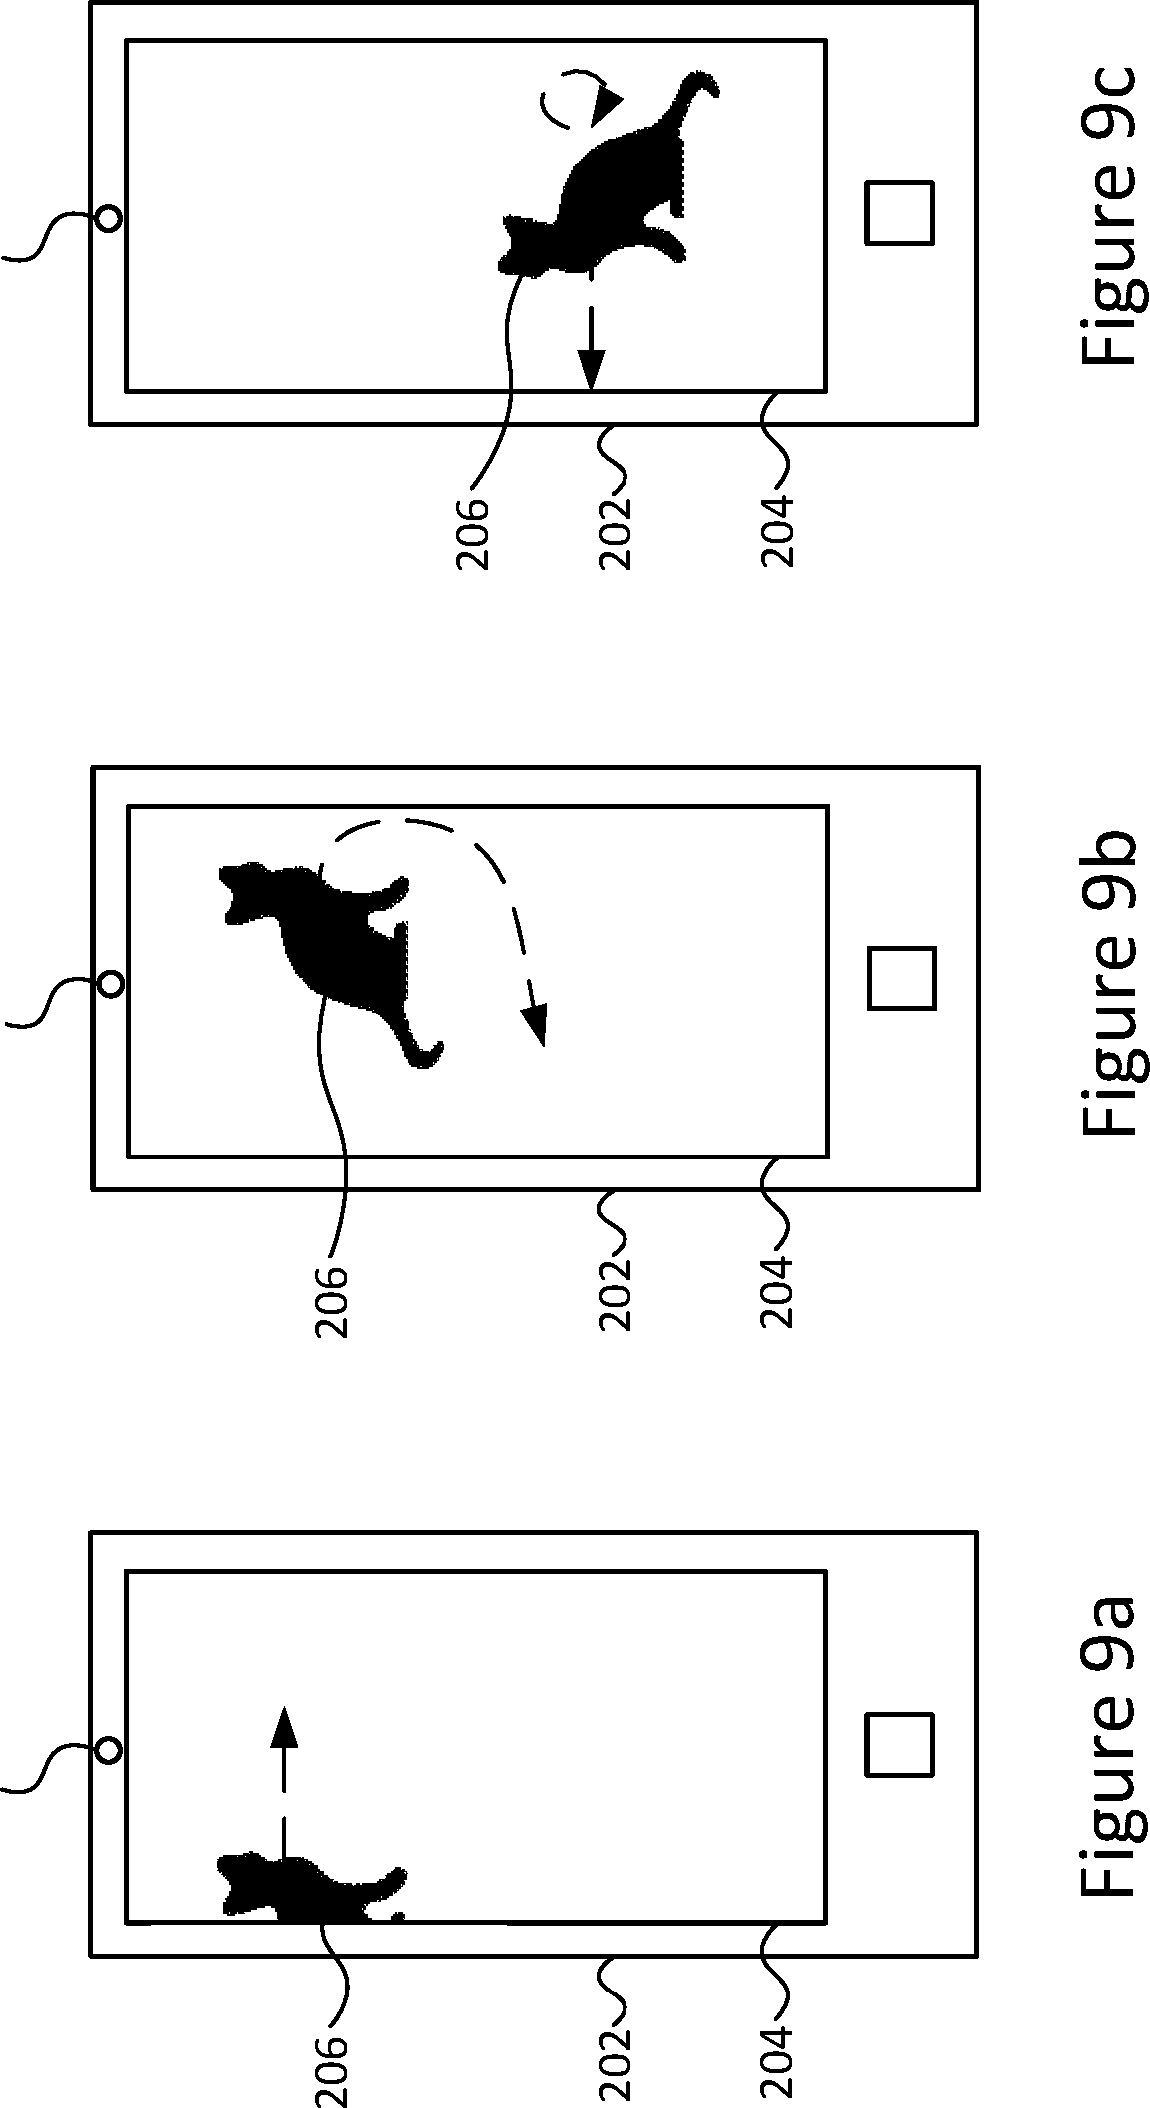 Figure GB2560340A_D0012